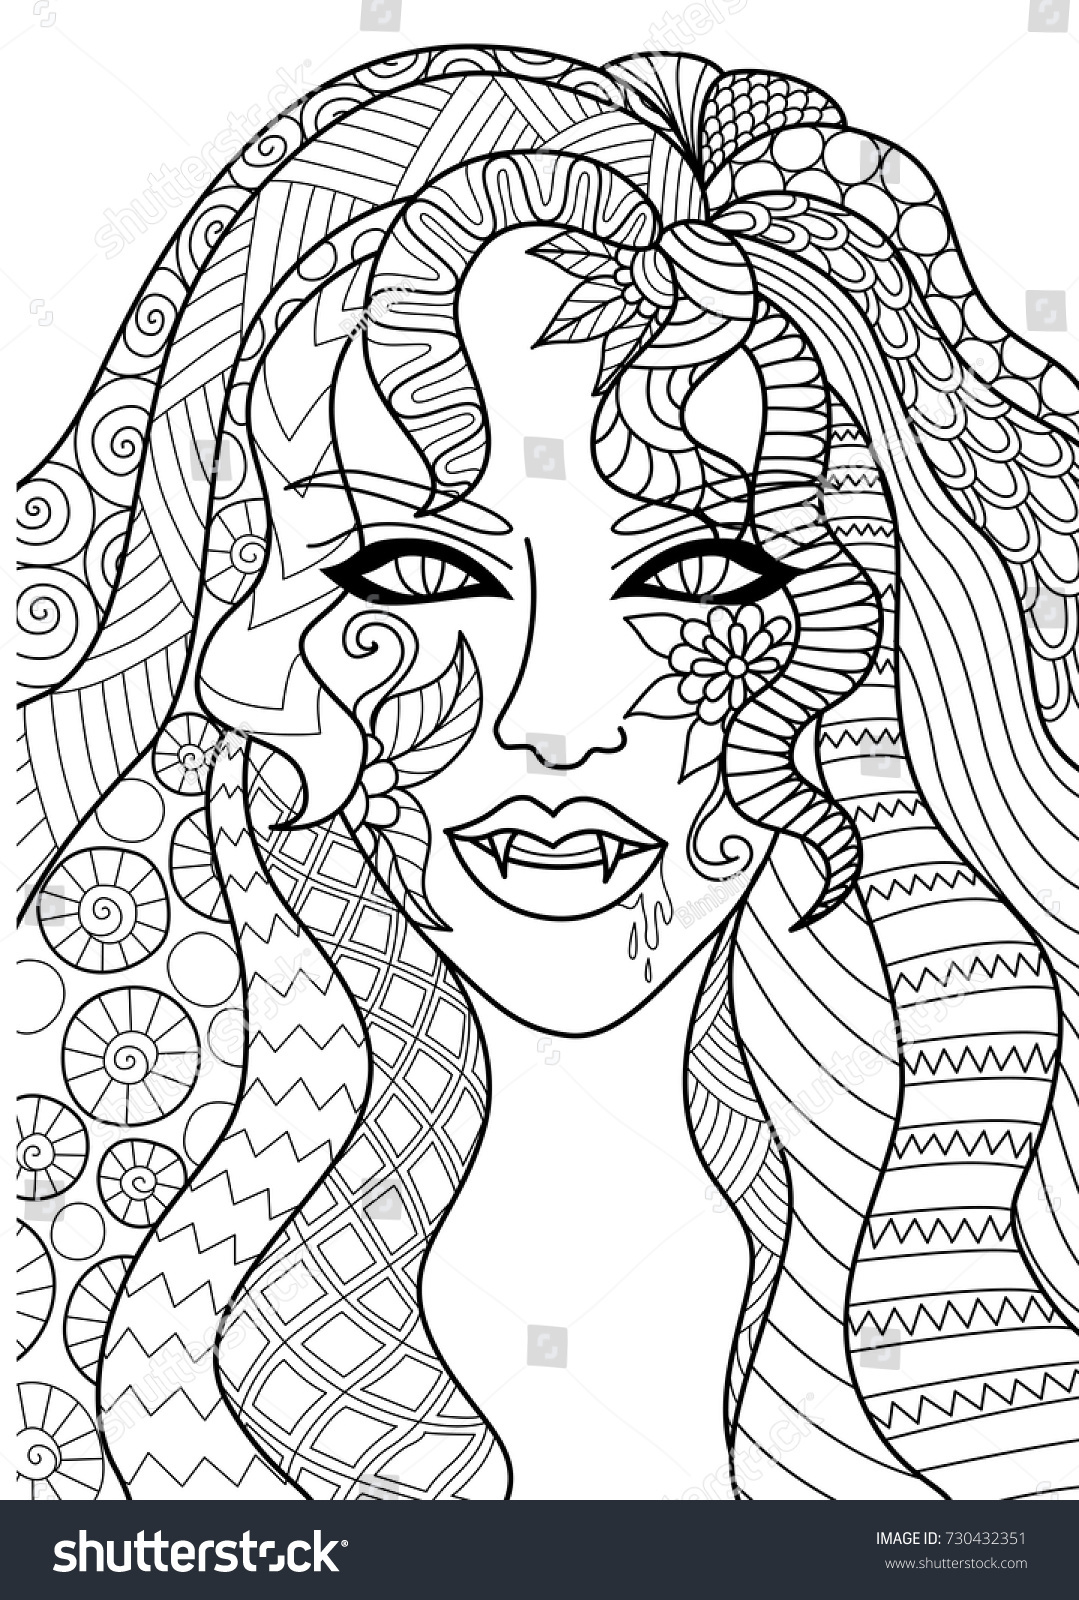 line art design witch head stock vector 730432351 shutterstock